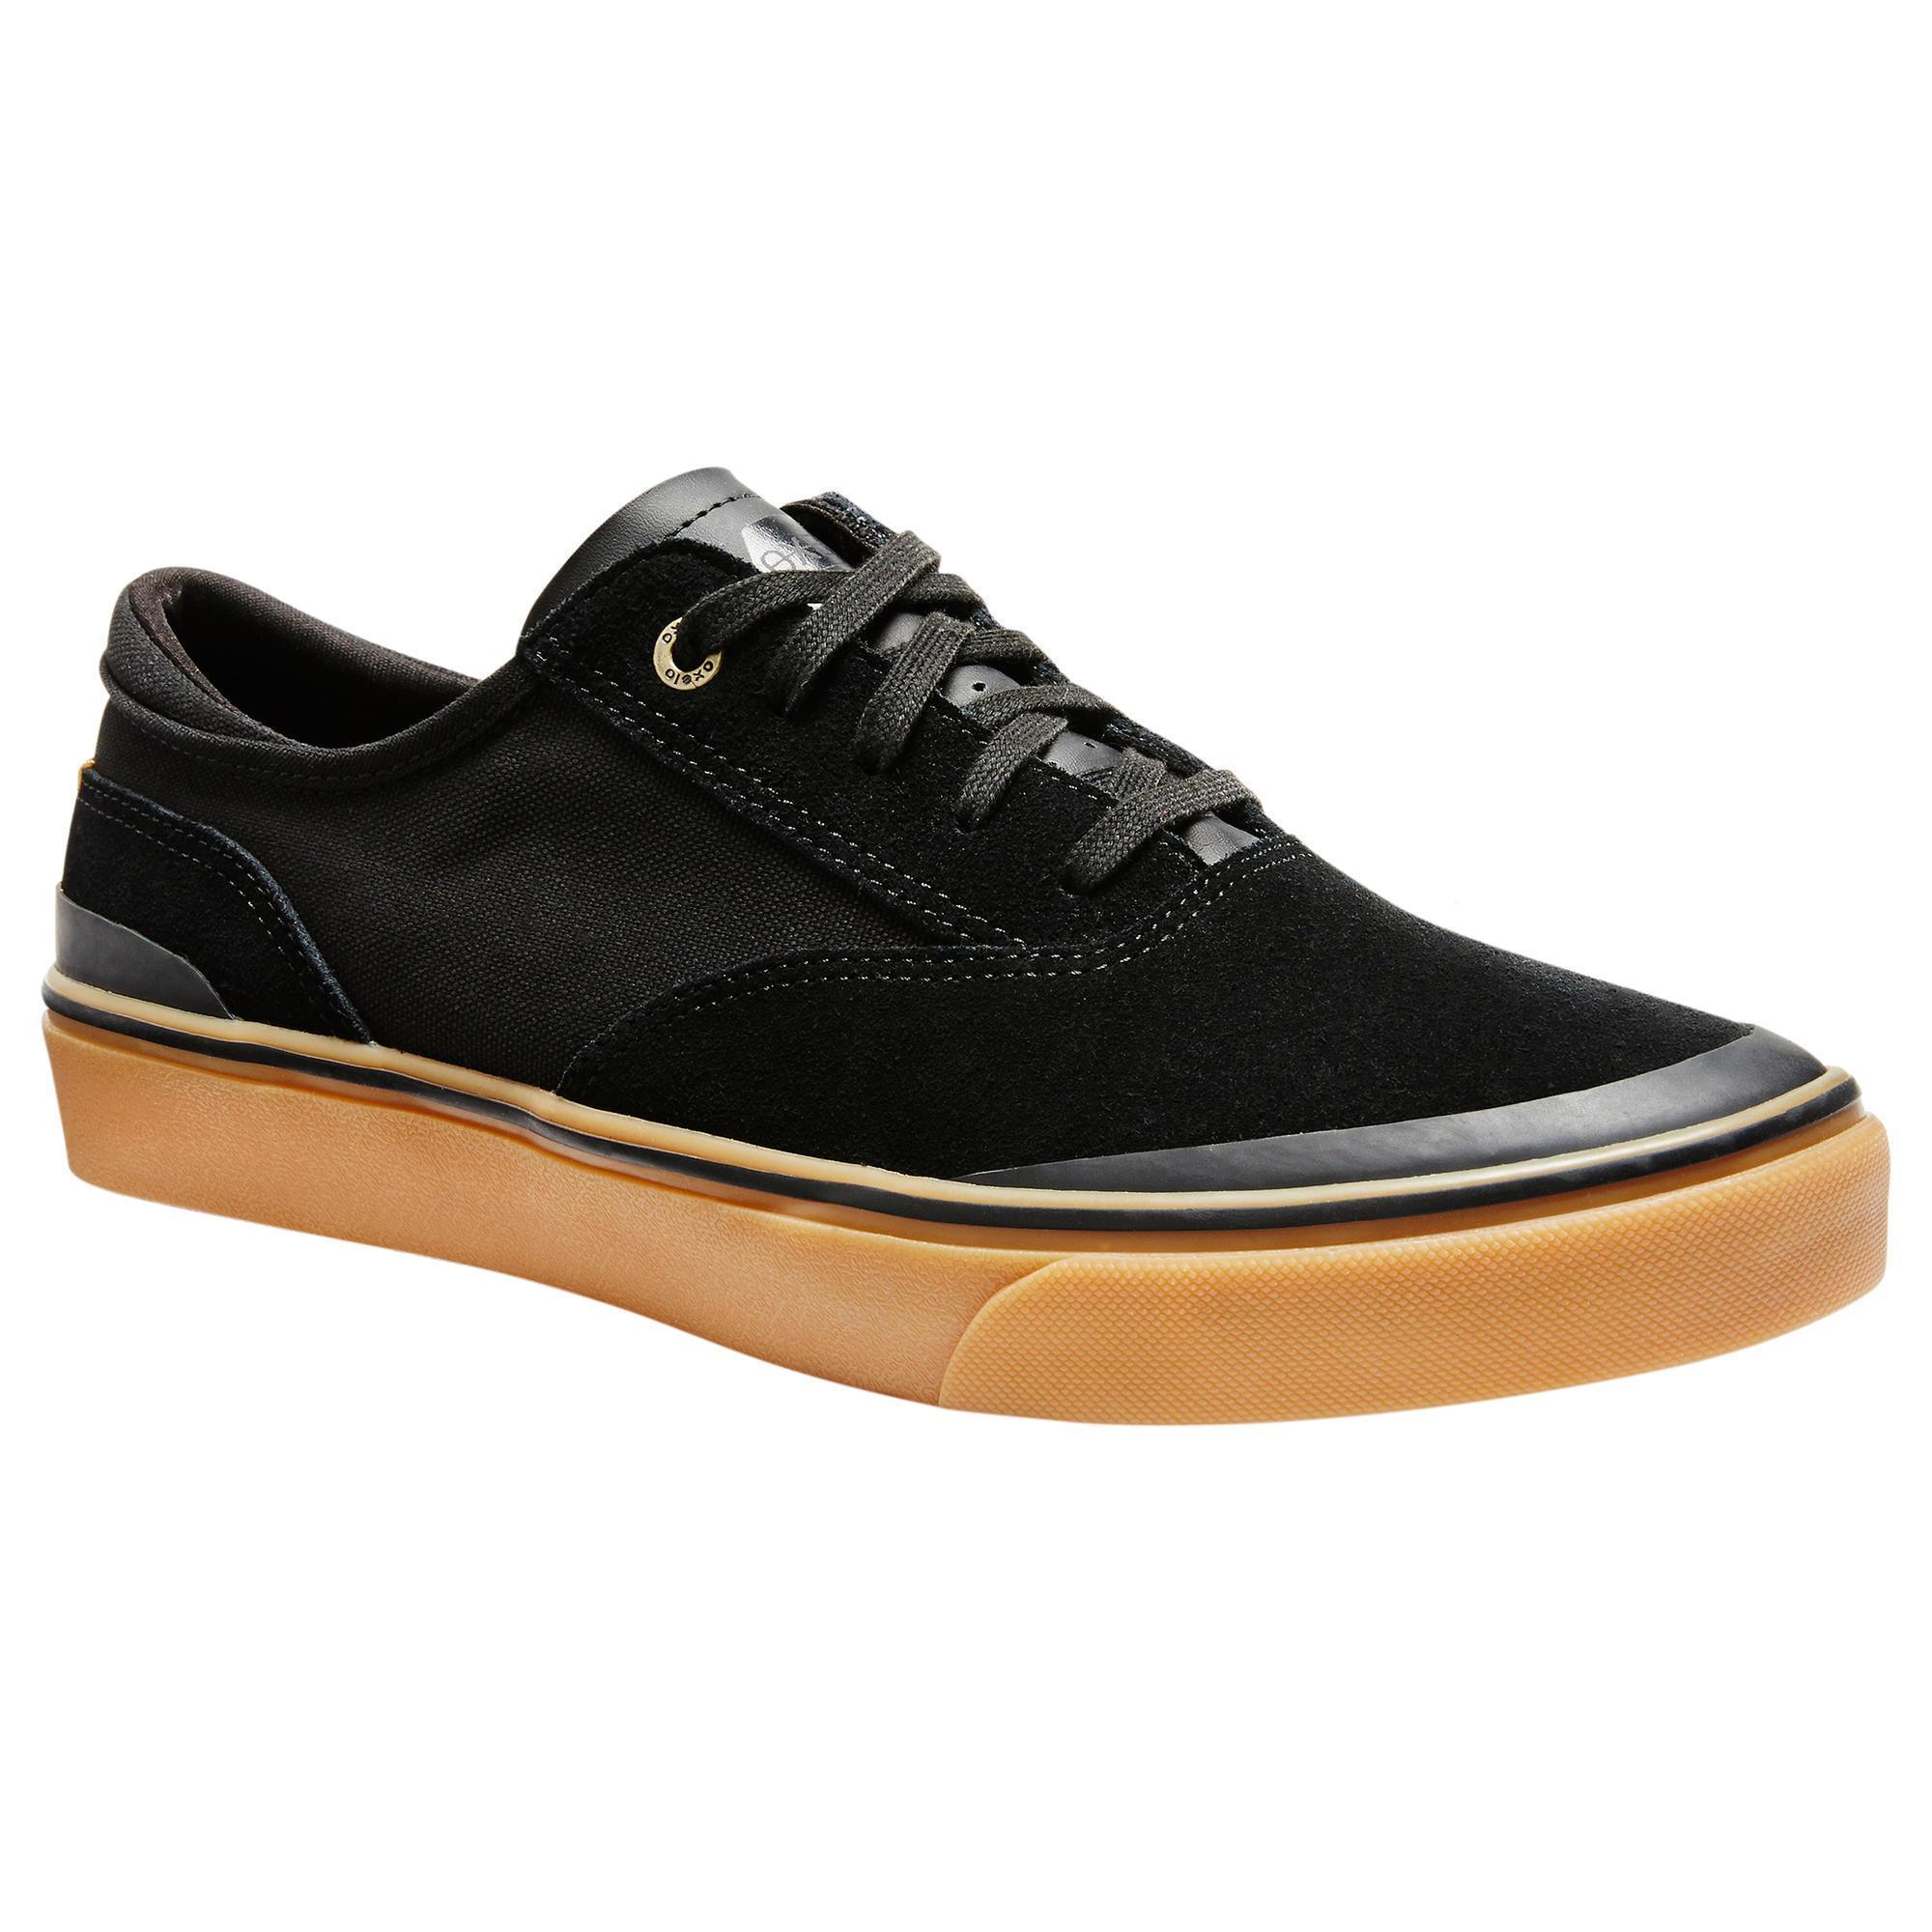 Oxelo Chaussures basses de skateboard adulte VULCA 500 noire, semelle gomme - Oxelo